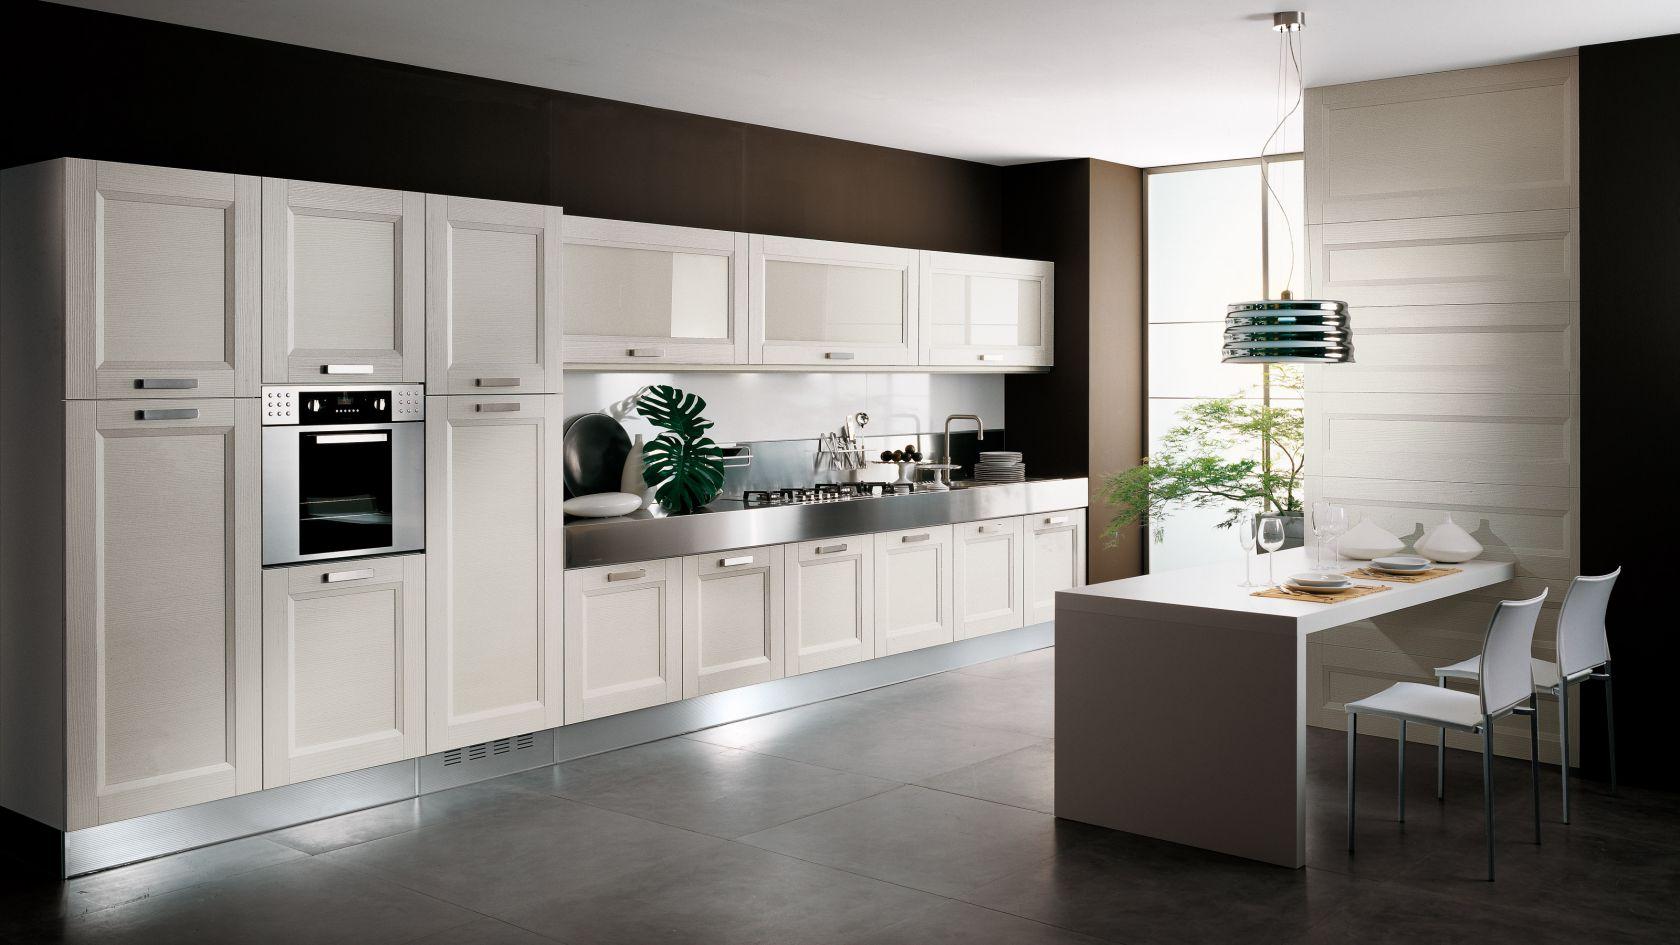 Cucine Effequattro Casa Arredi Di Bonari #4B5D45 1680 945 Ebay Top Cucina Laminato